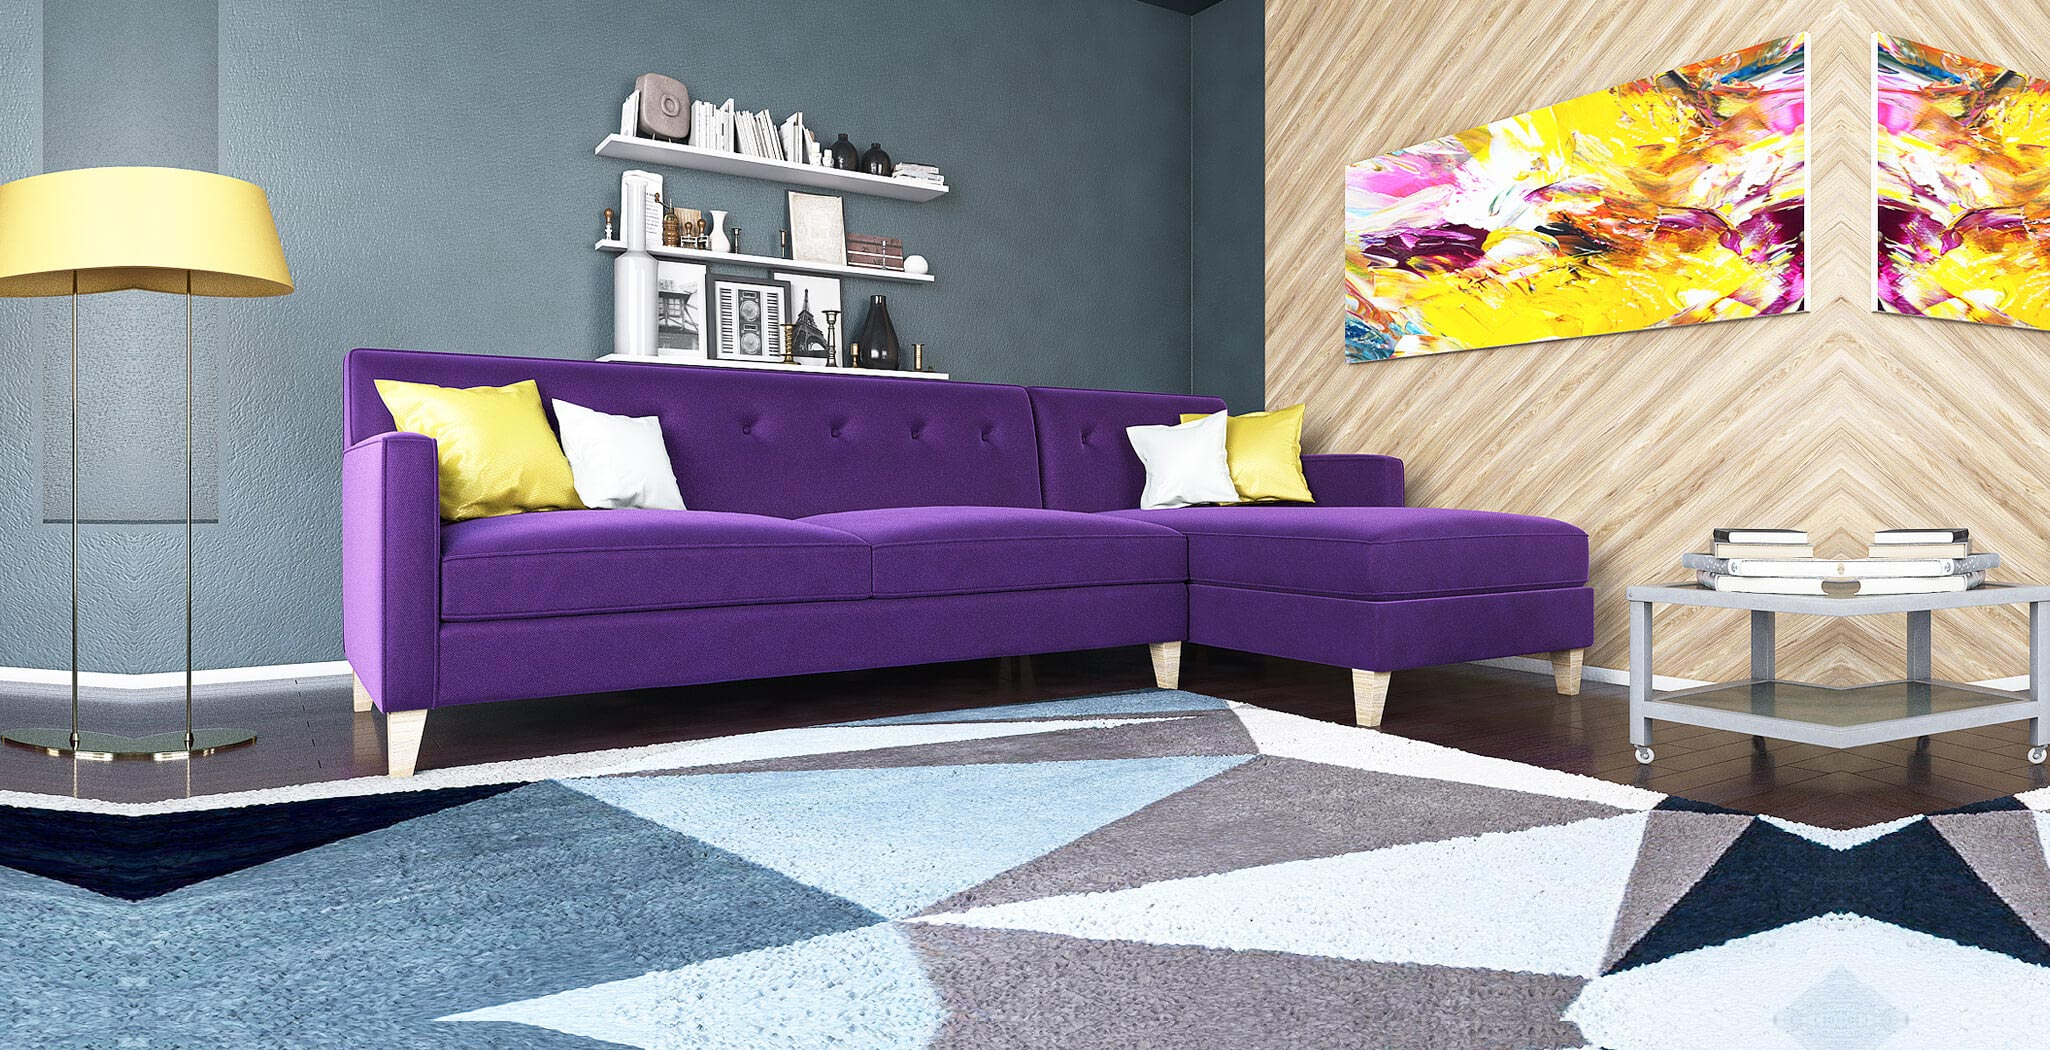 harper panel furniture gallery 4